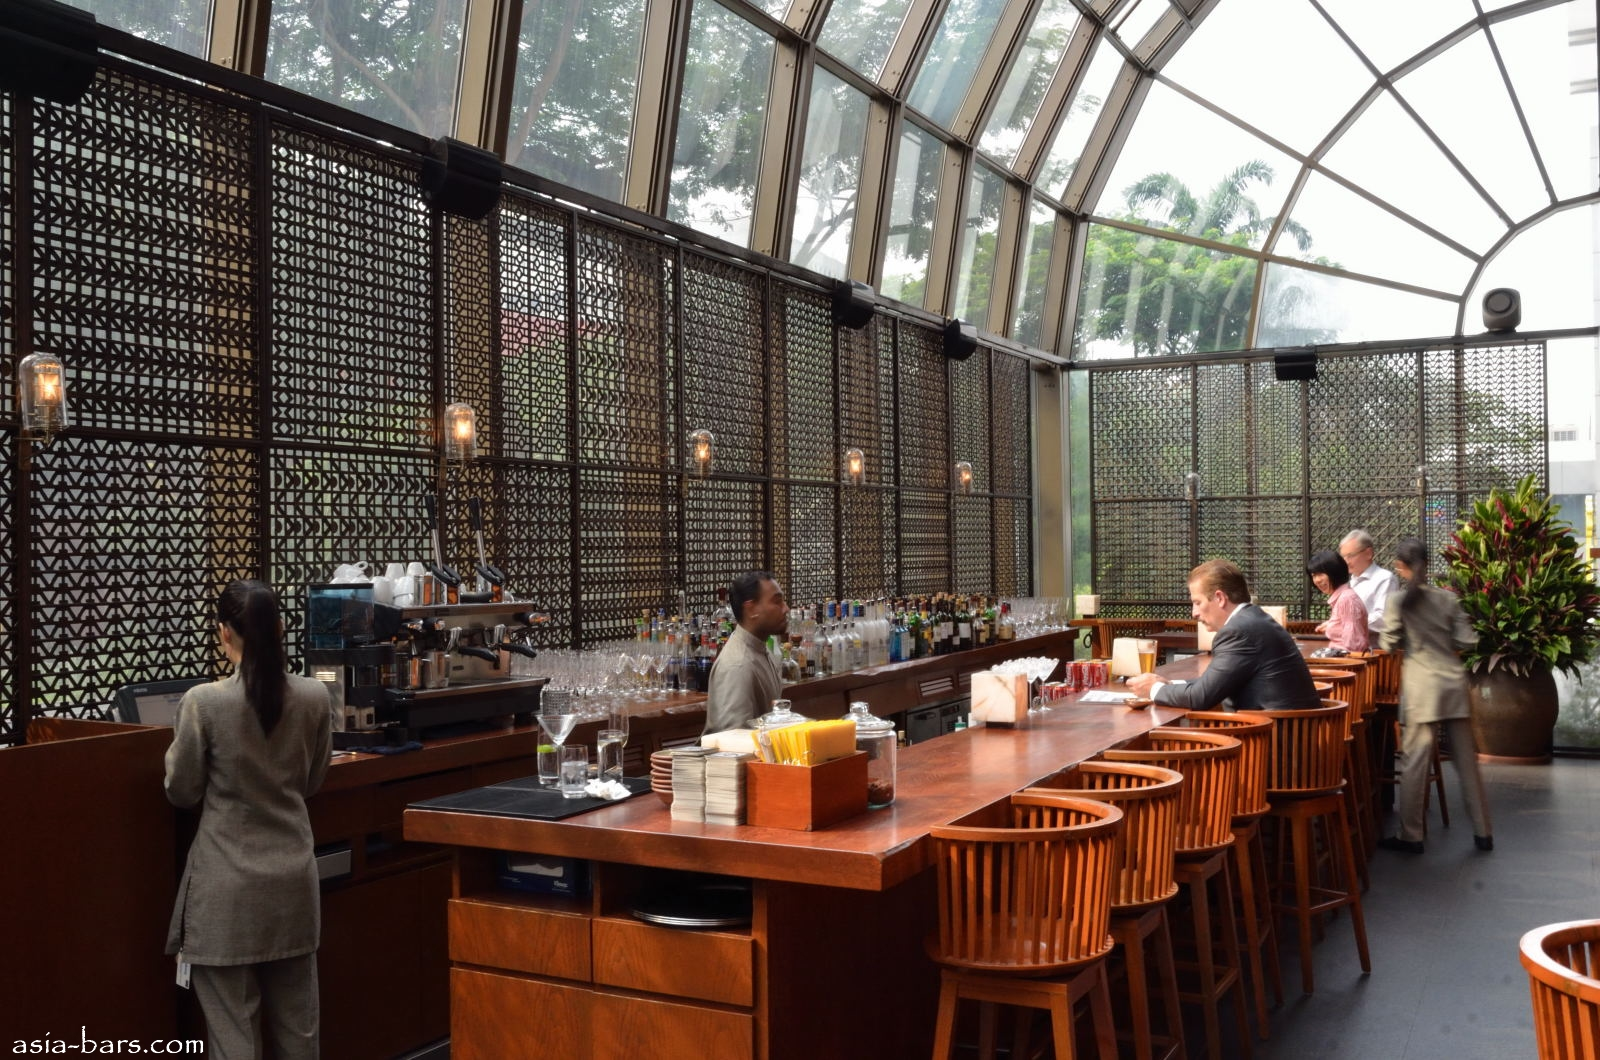 Martin 39 s martini bar bar restaurant fort collins co 80524 for Asian cuisine mohegan lake ny